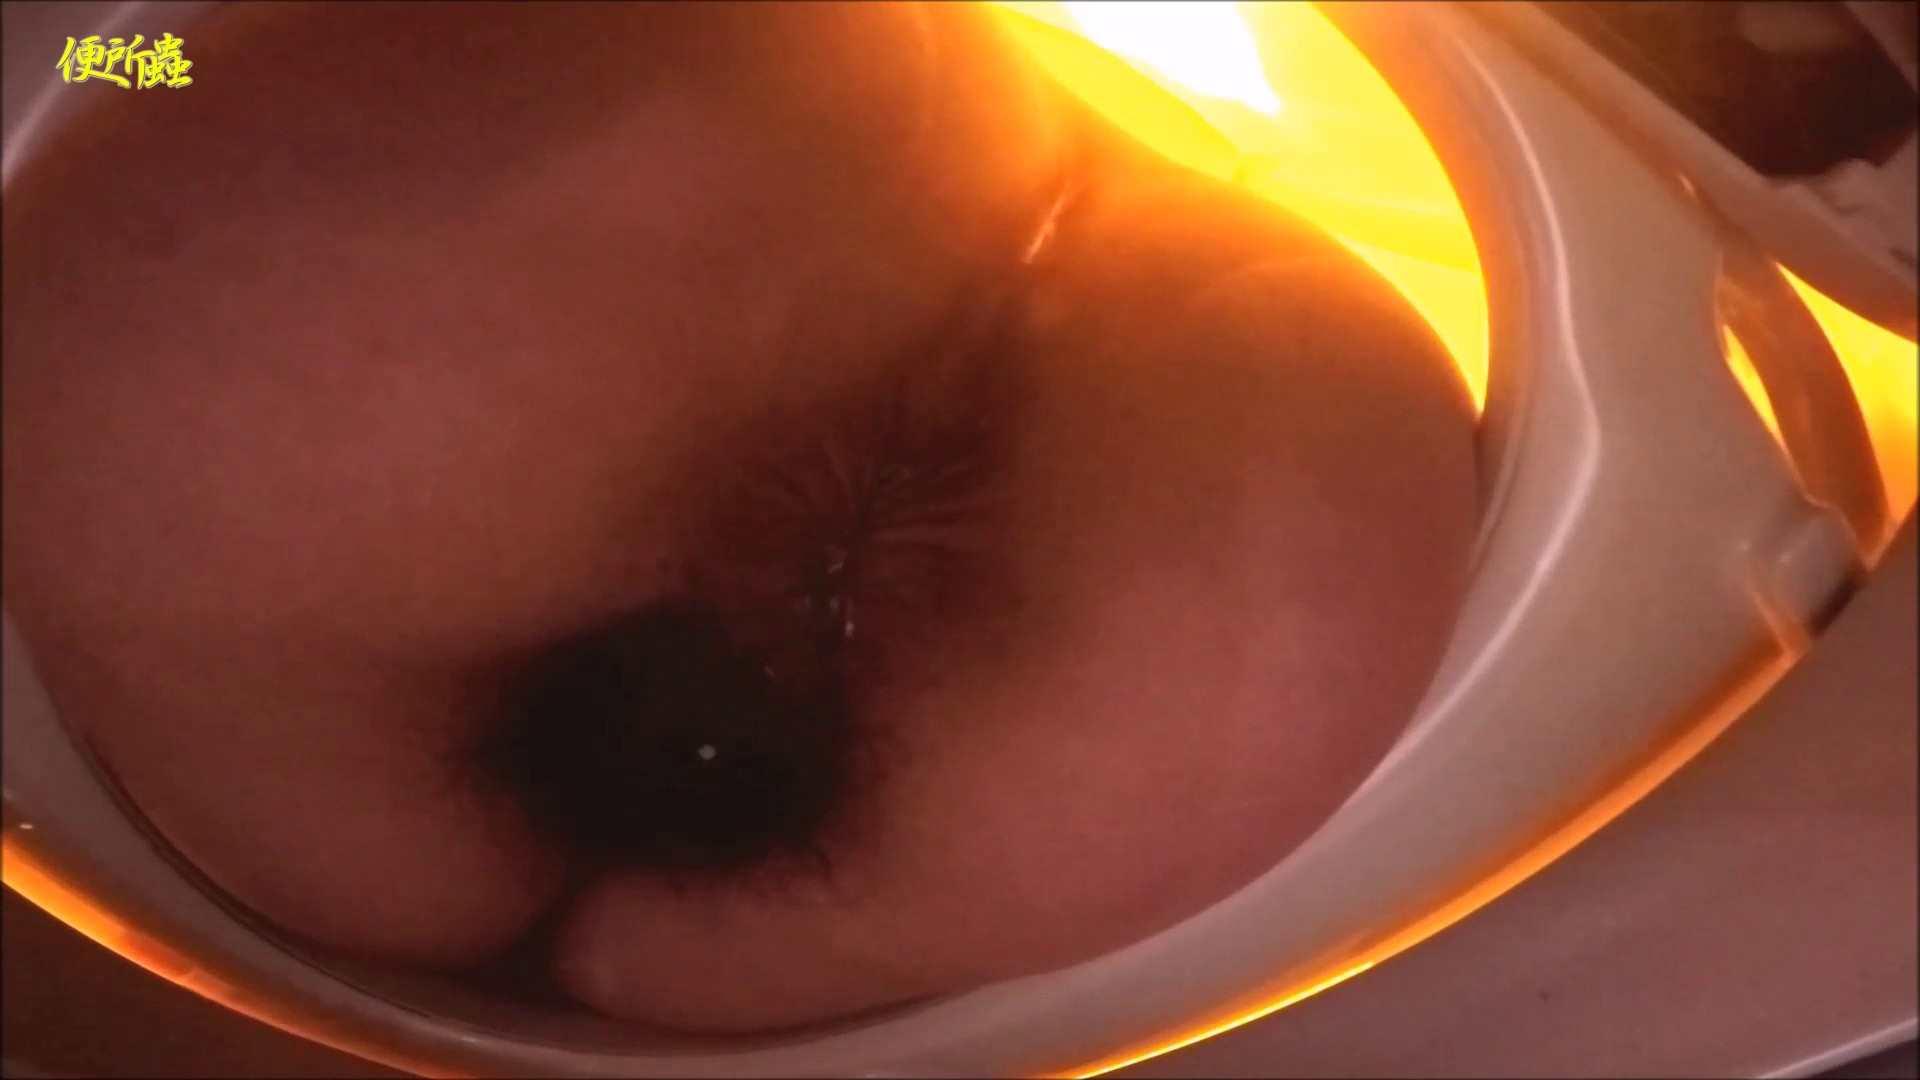 vol.08 便所蟲さんのリターン~寺子屋洗面所盗撮~ 丸見え エロ画像 94画像 10